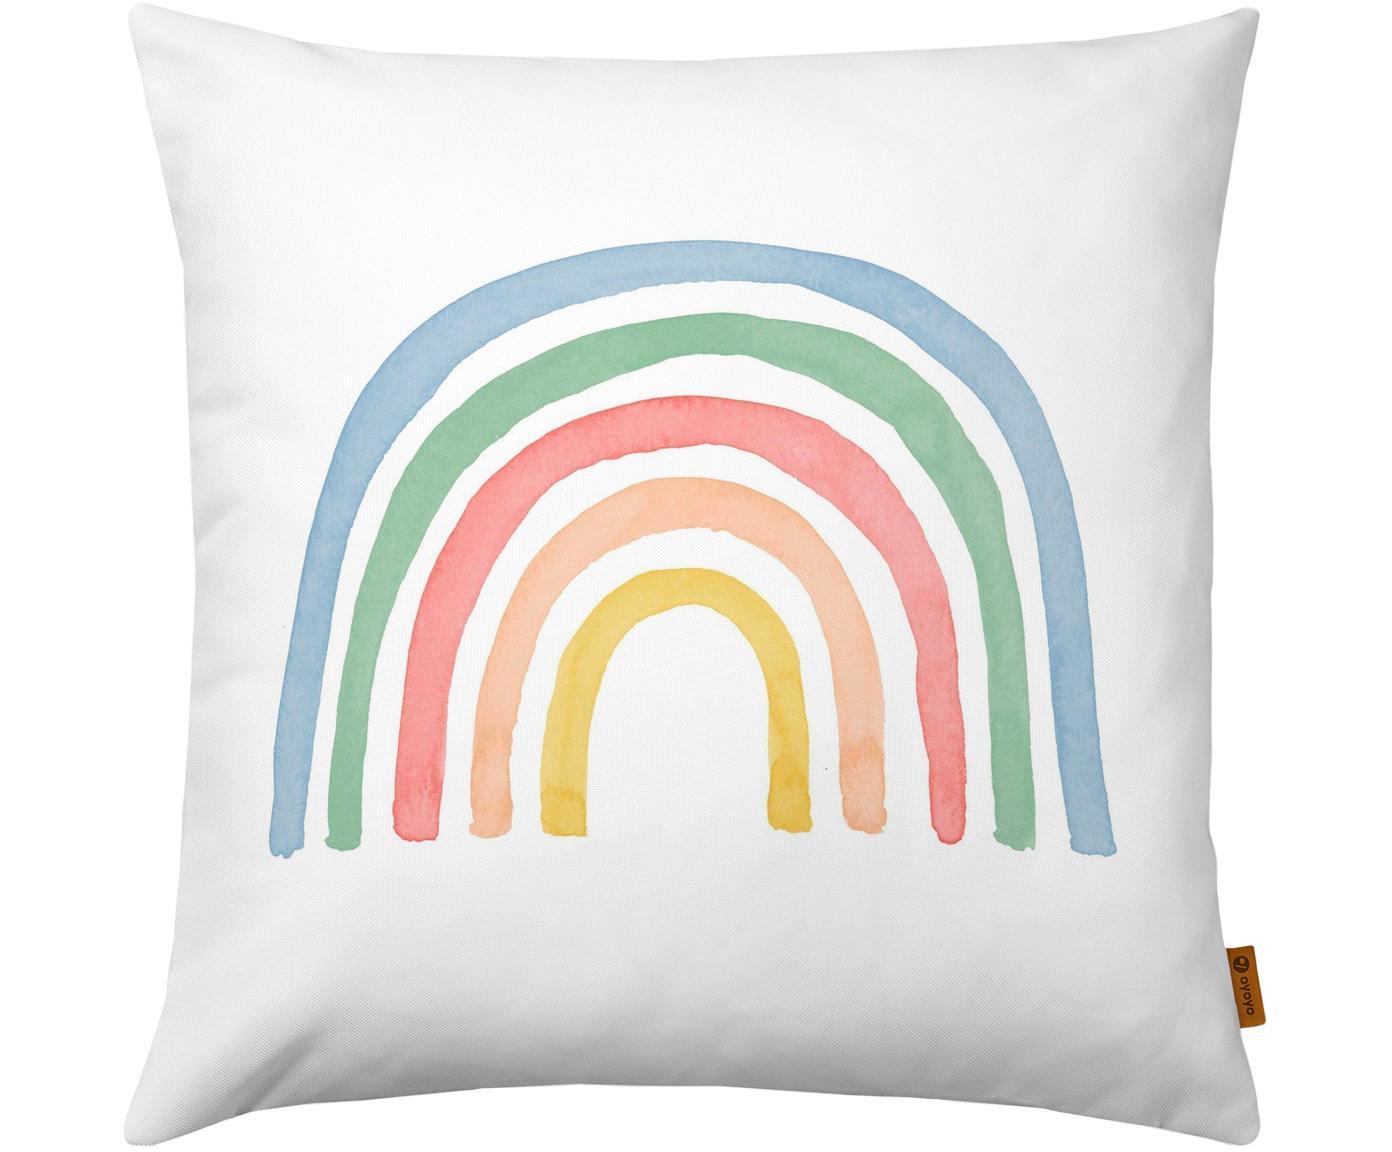 Federa con arcobaleno Rainbow, Cotone, Bianco, multicolore, Larg. 40 x Lung. 40 cm